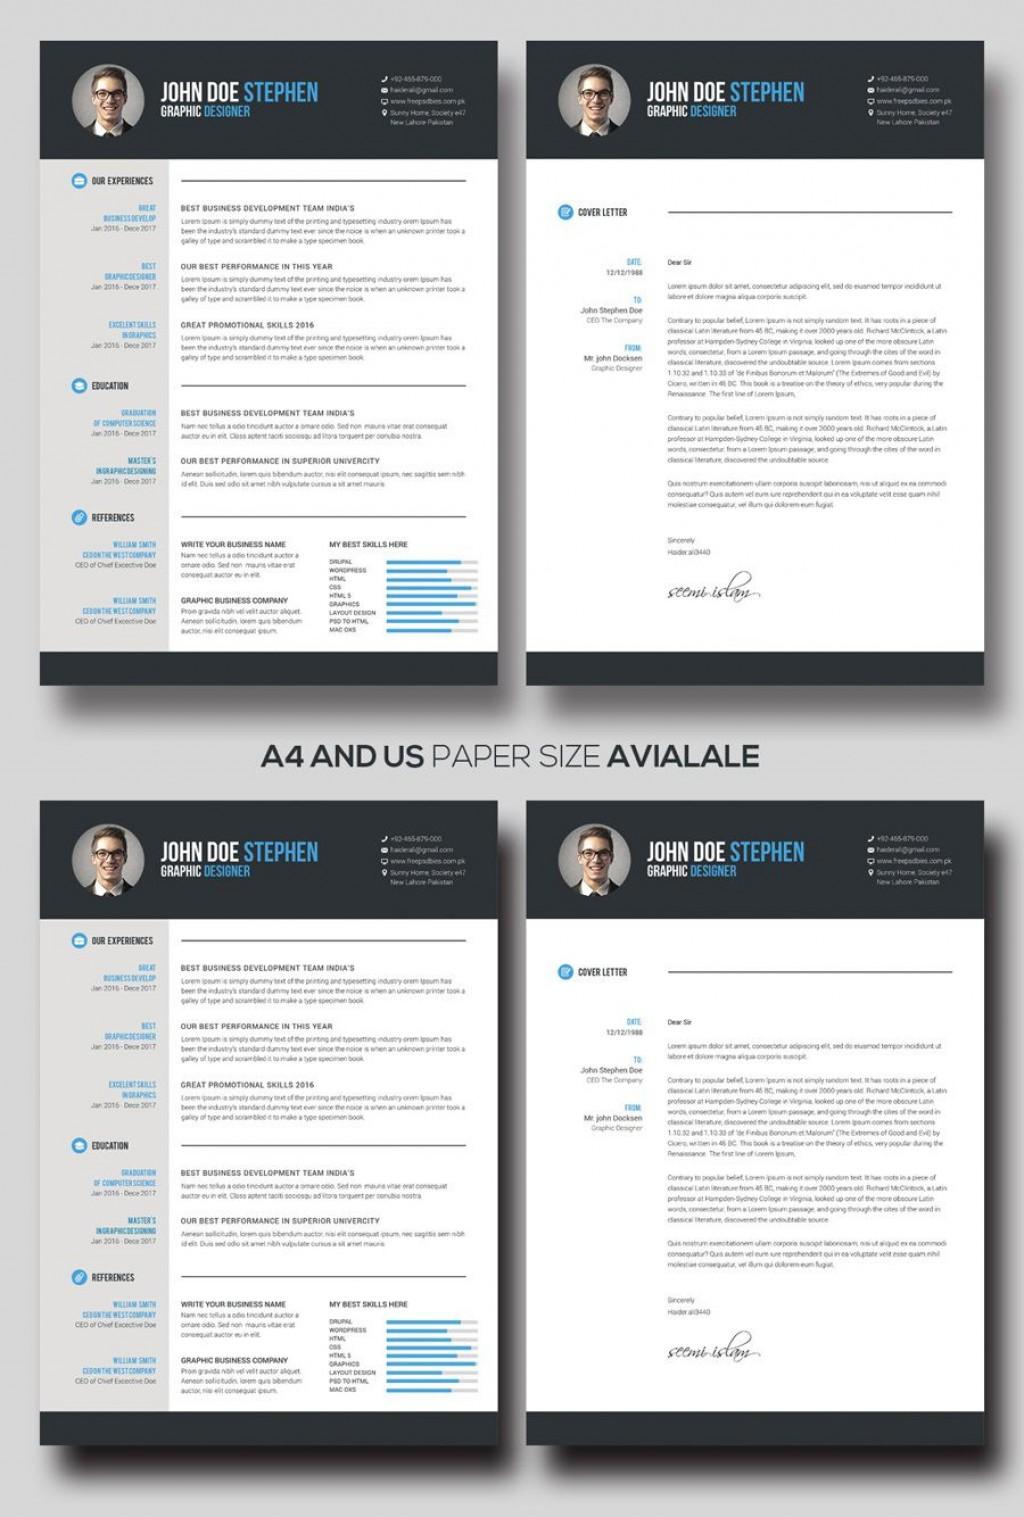 006 Remarkable Microsoft Word Template Download Photo  M Cv Free HeaderLarge